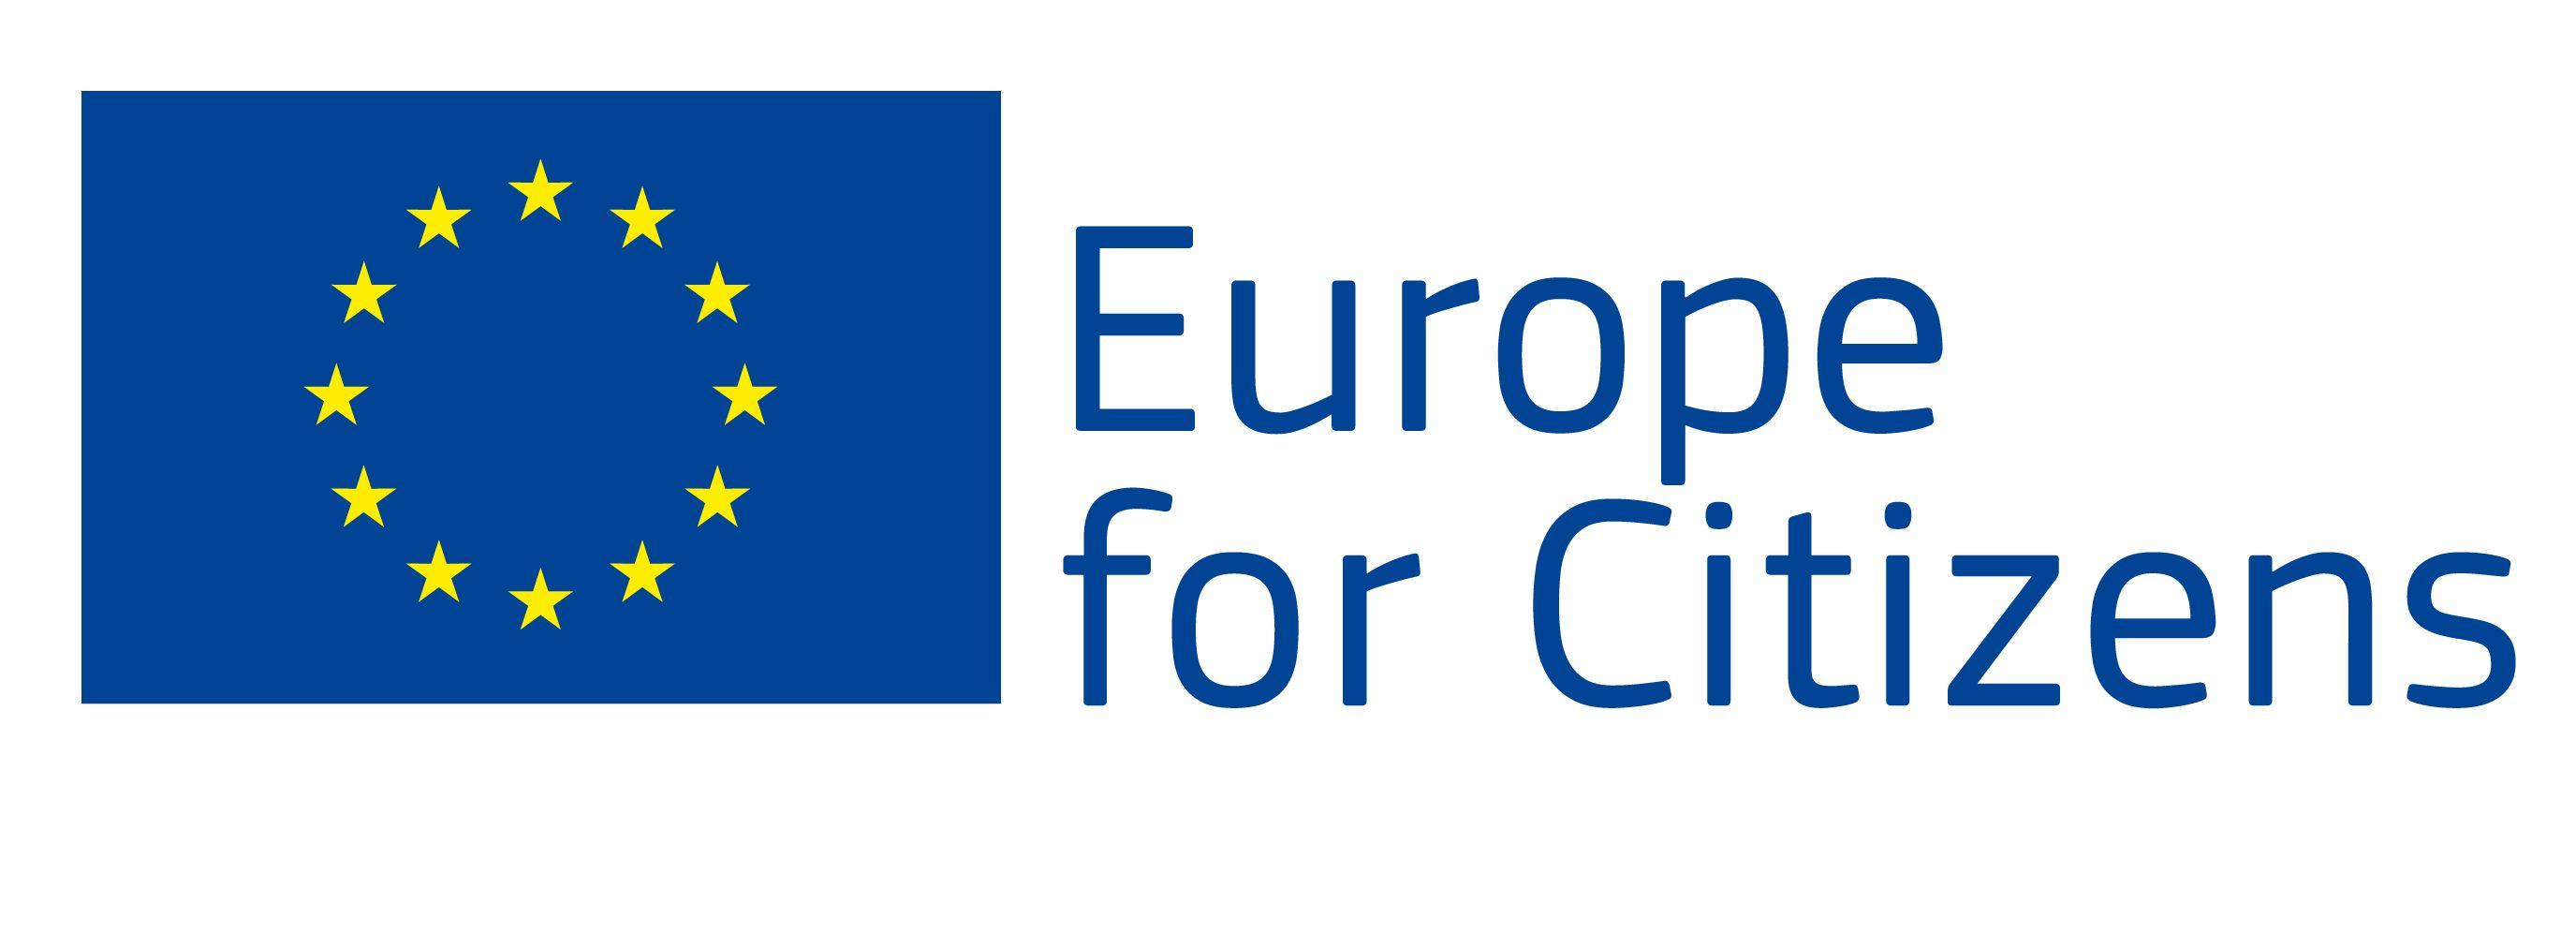 eu_flag_europe_for_citizens_en